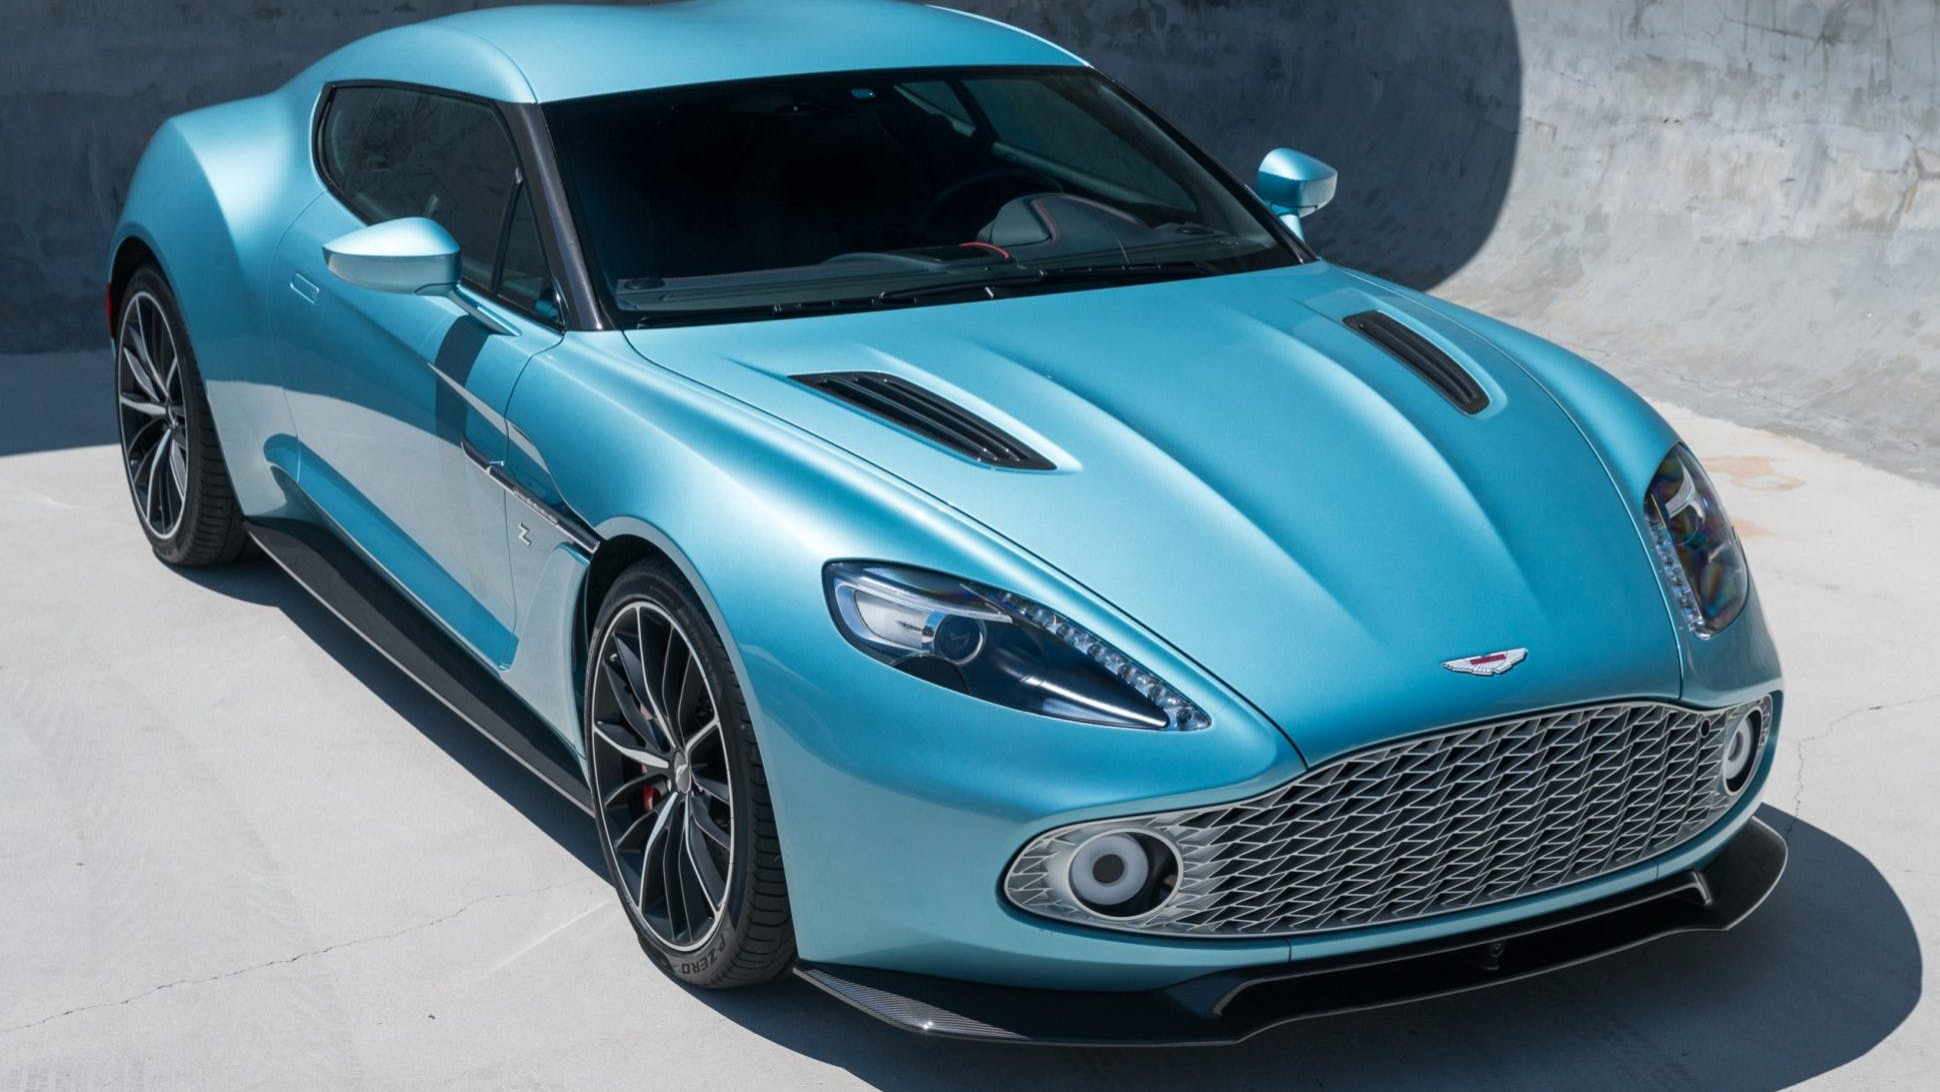 2018 Aston Martin Vanquish Zagato Coupe Vin Scflmcpz0jgj33889 Classic Com